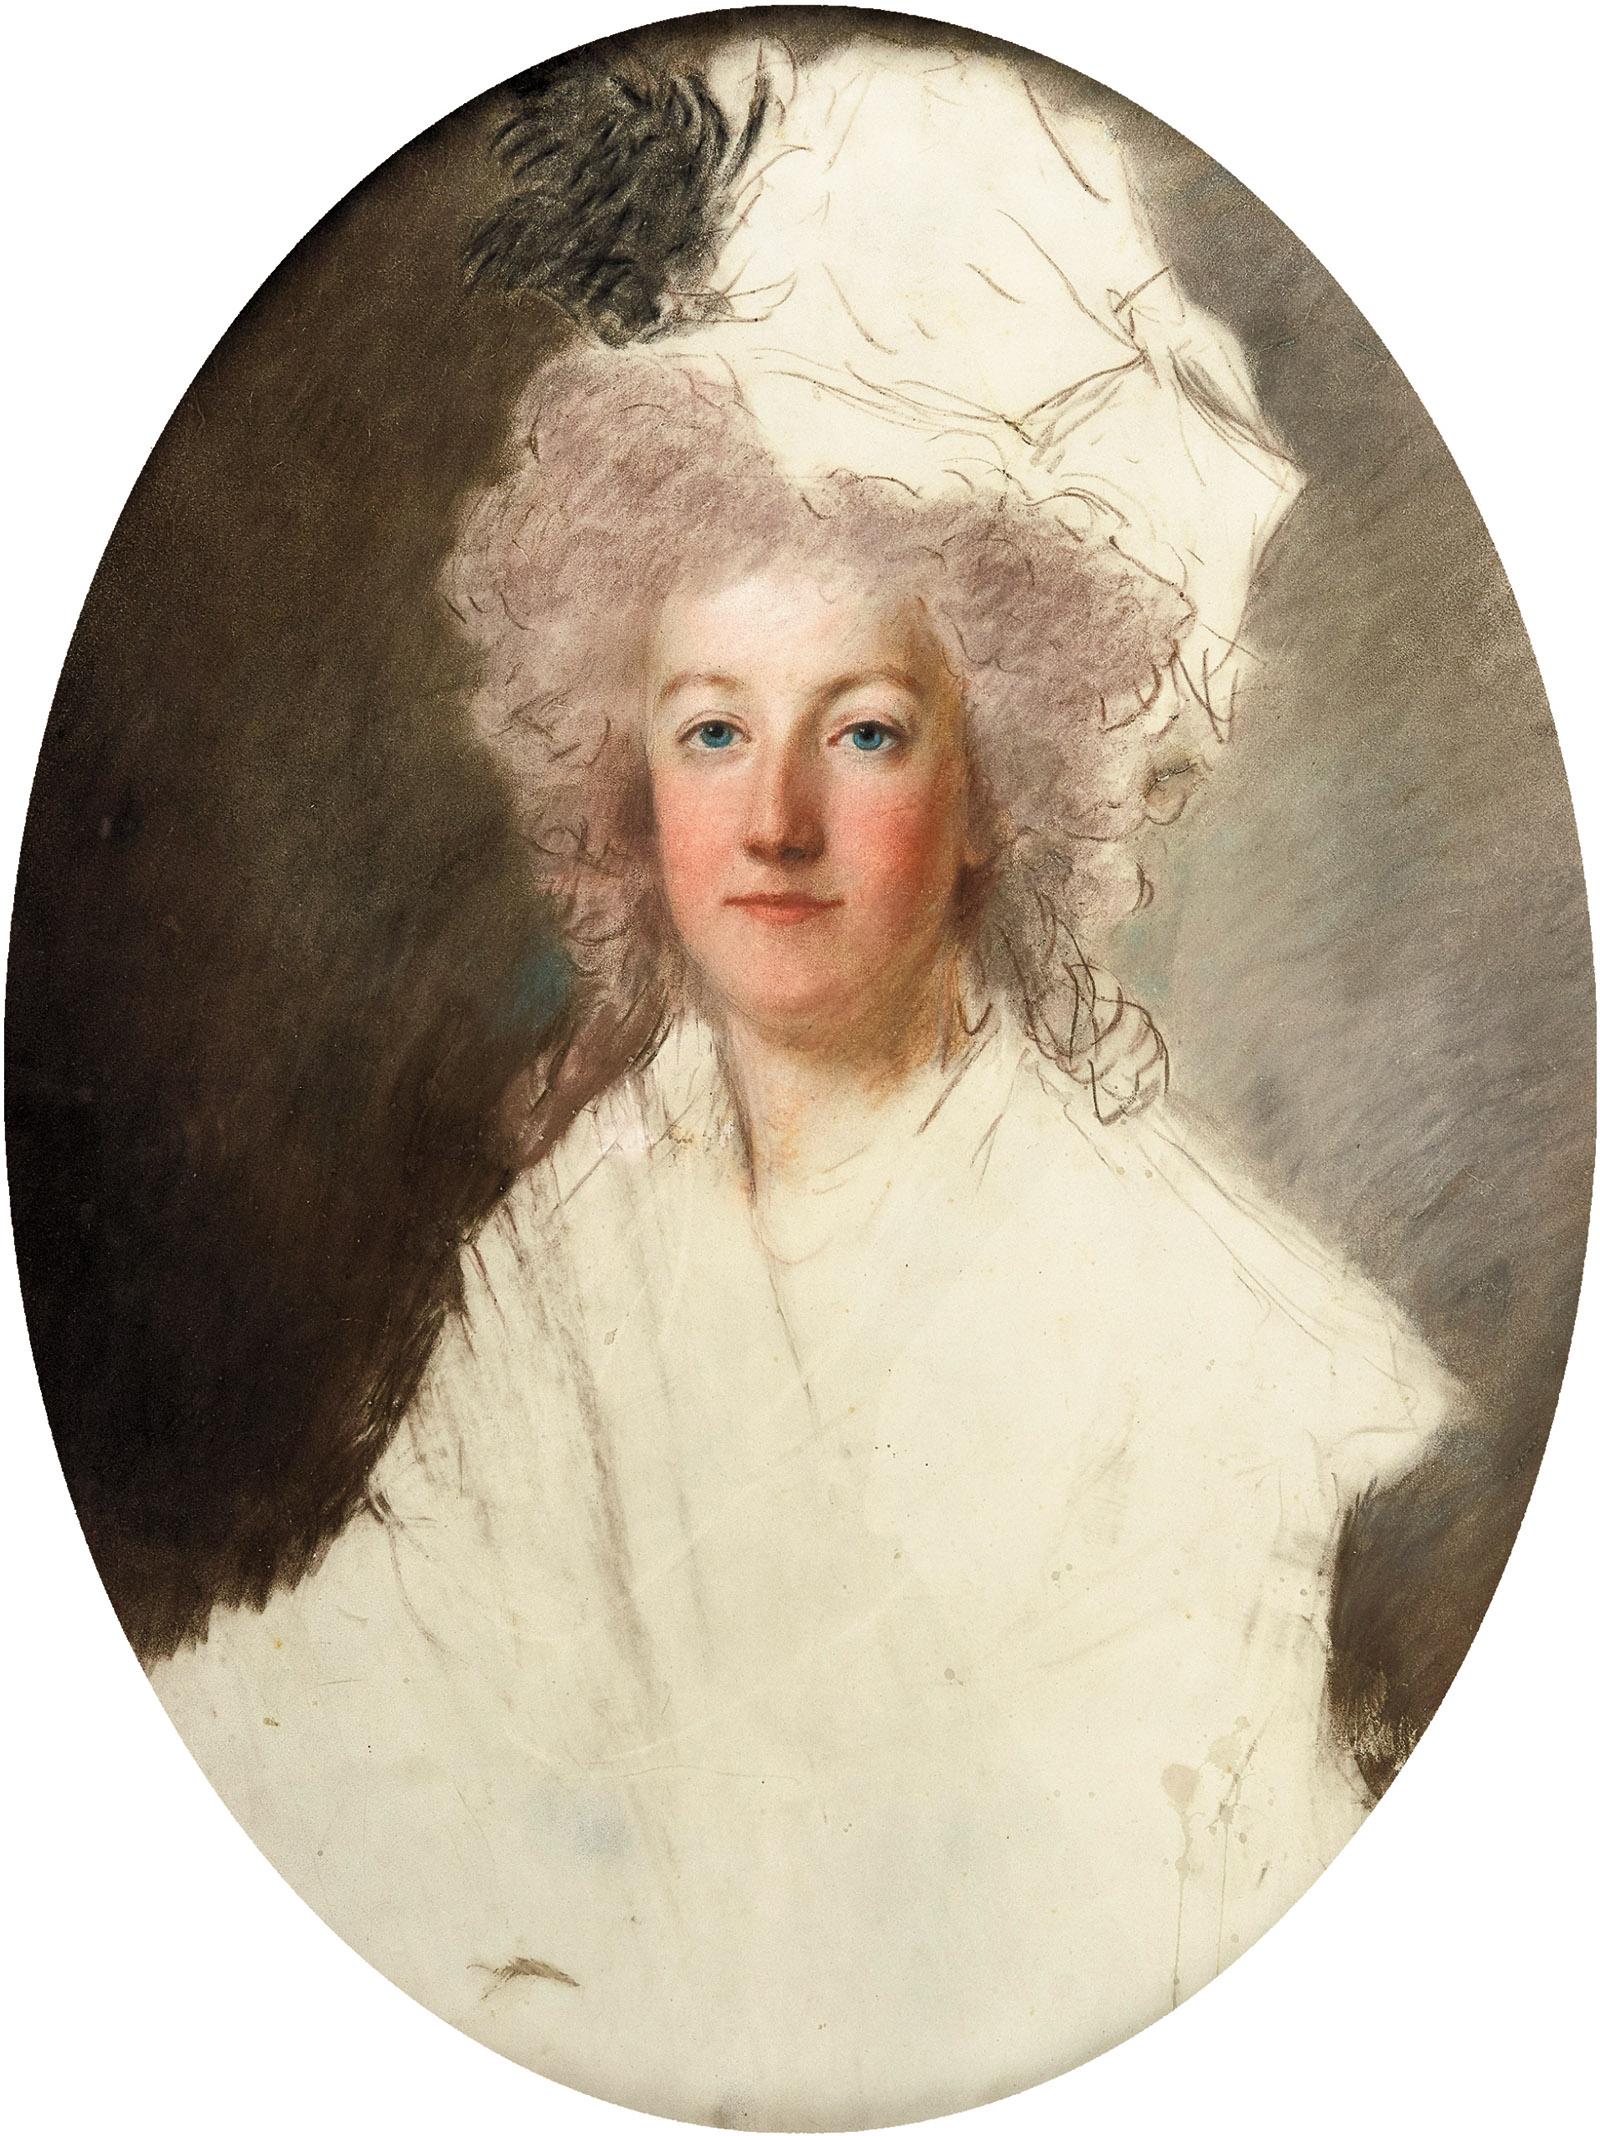 Marie-Antoinette; unfinished portrait by Alexander Kucharsky, 1791–1792